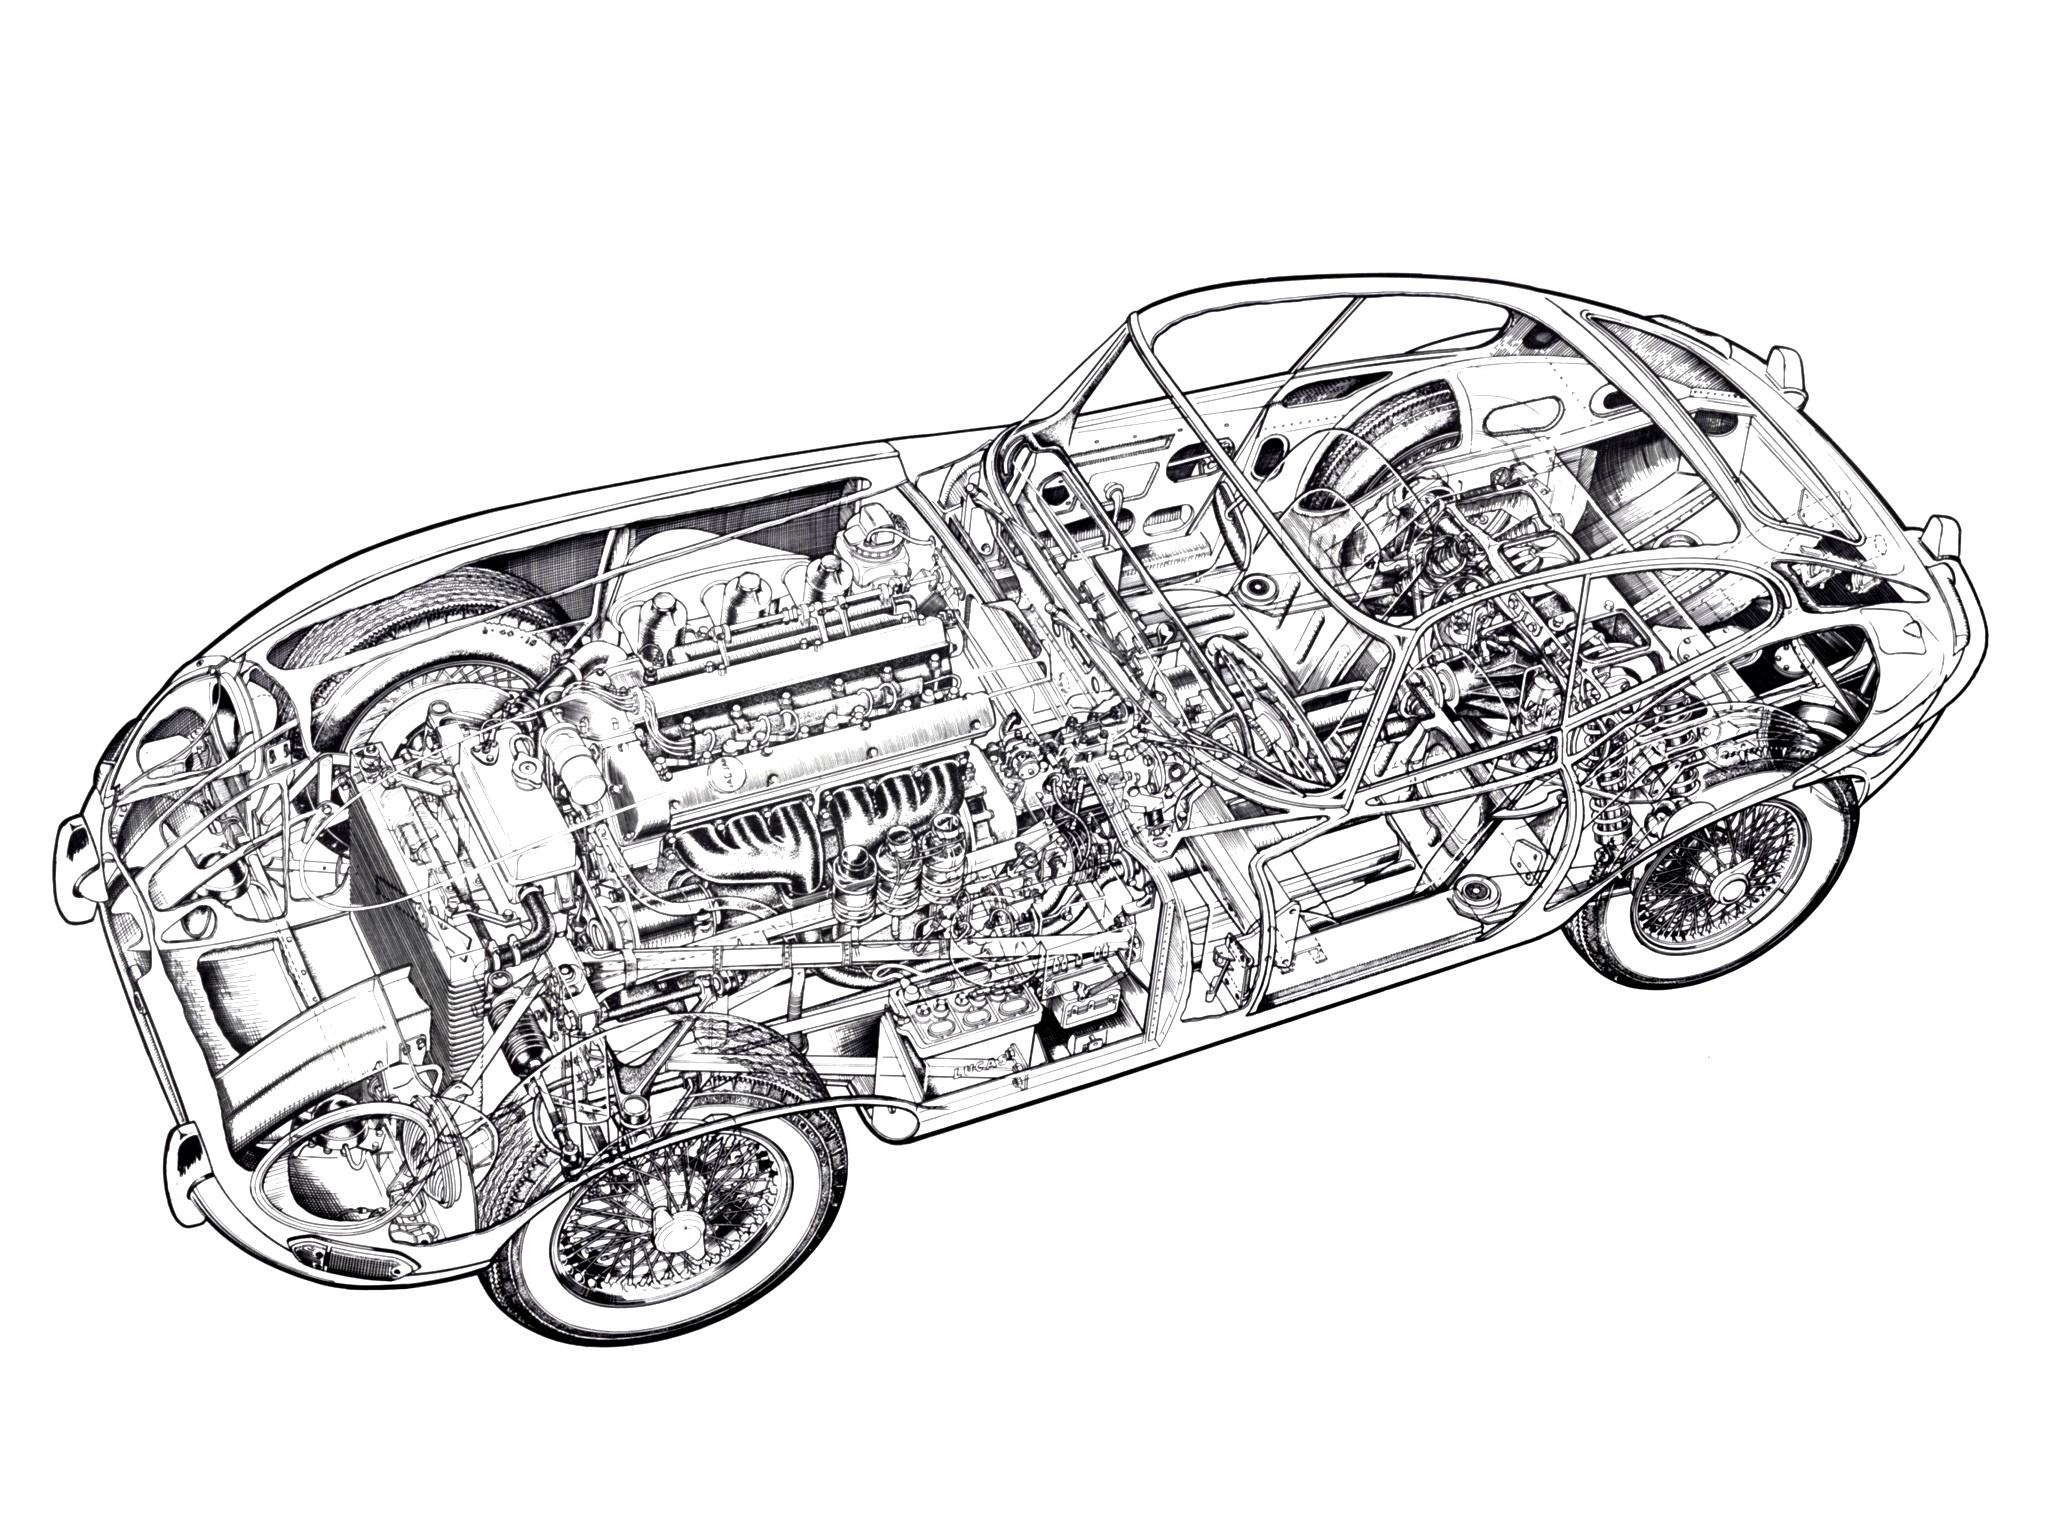 1961 jaguar e type fixed head coupe classic supercar supercars rh wallpaperup com Jet Engine Cutaway Diagram Labelled Jet Engine Cutaway Diagram Labelled